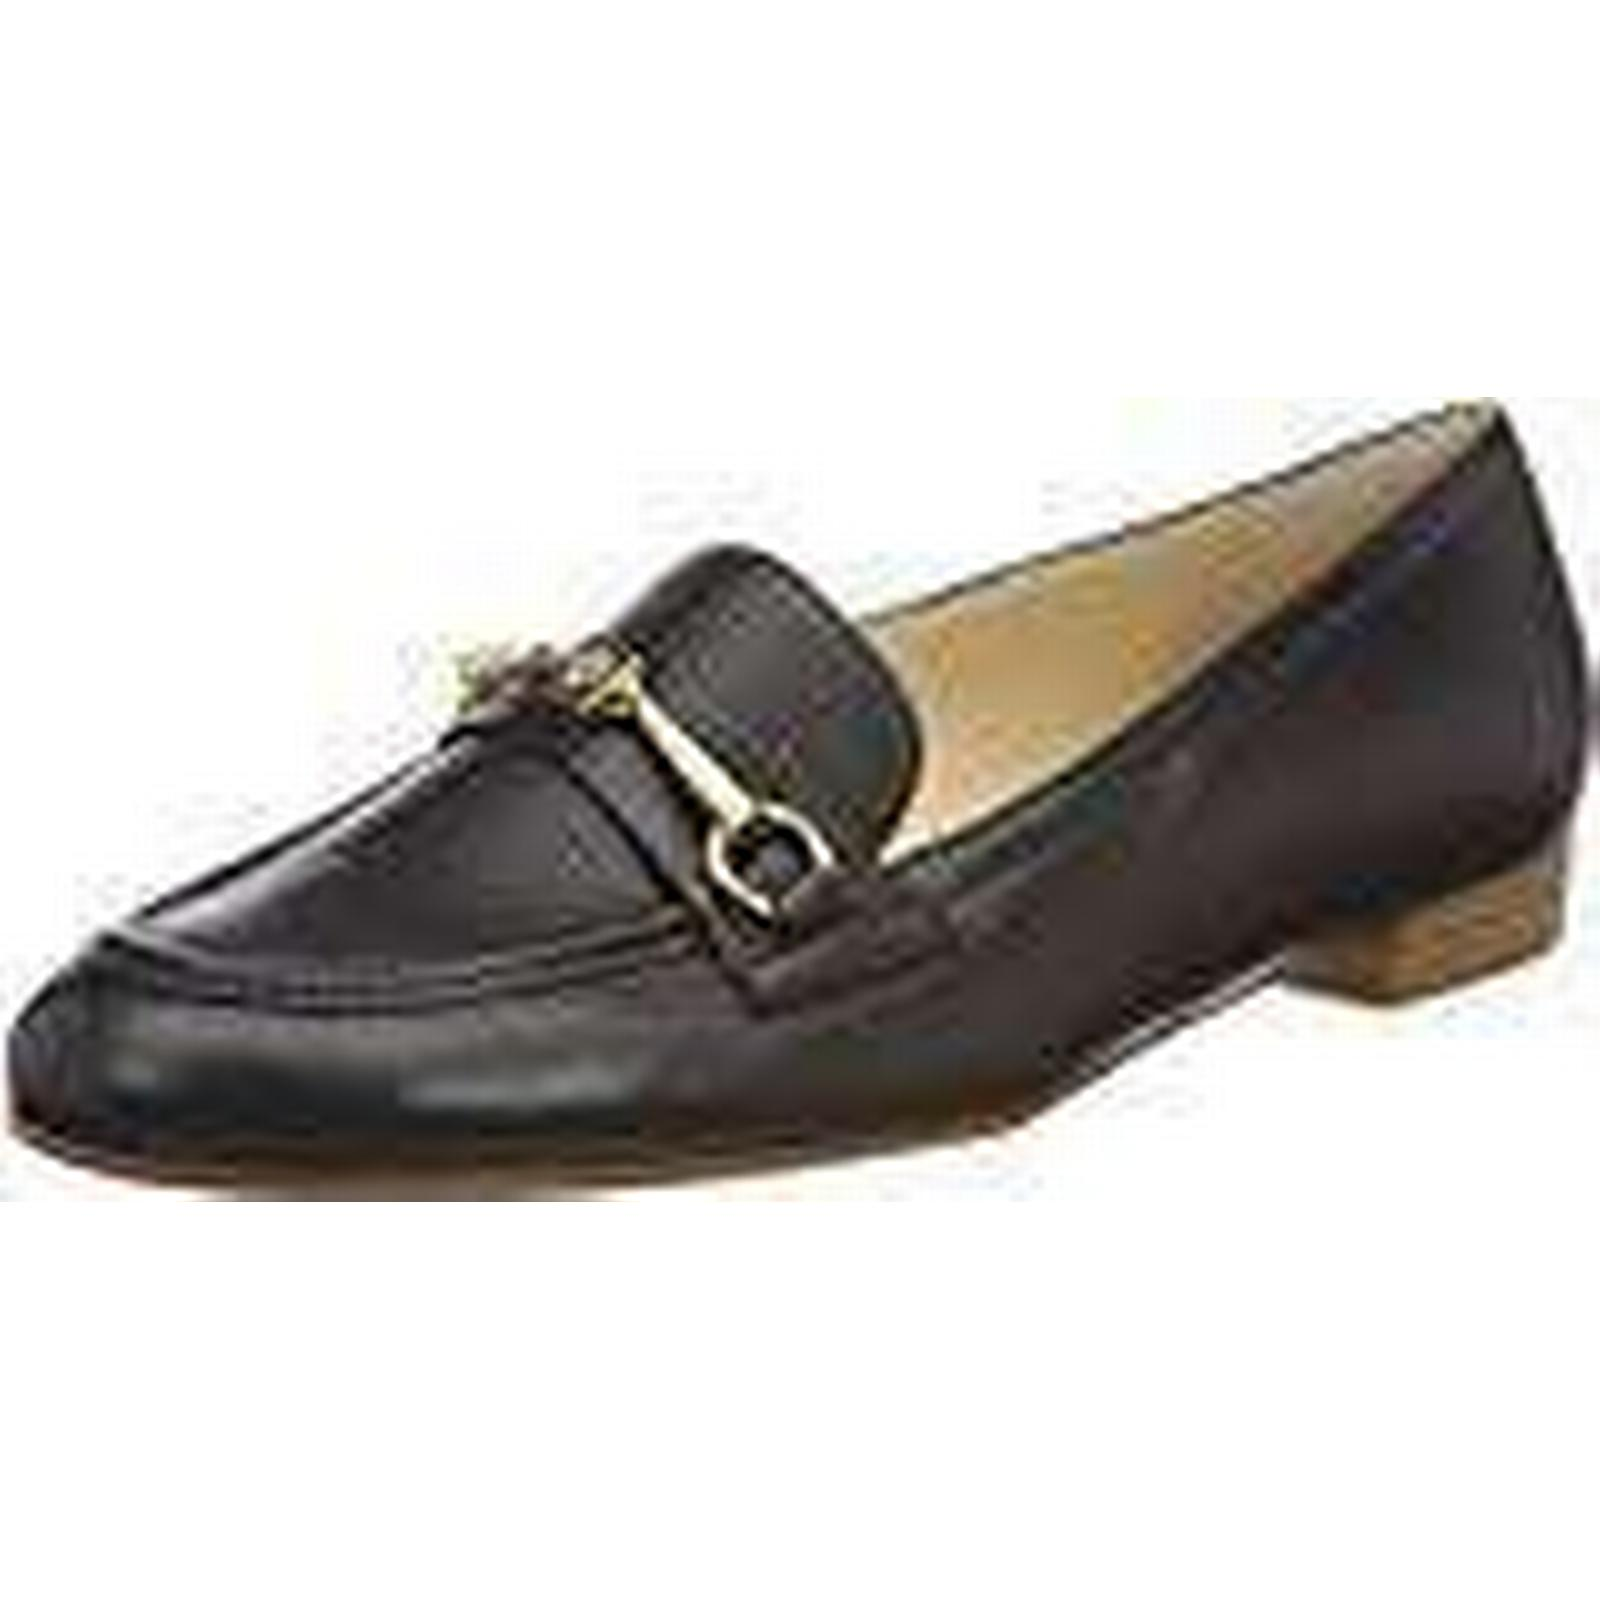 HÖGL Women's 5-10 UK 1630 Loafers, Black (Schwarz 0100), 6 UK 5-10 6 UK 3dfc5d